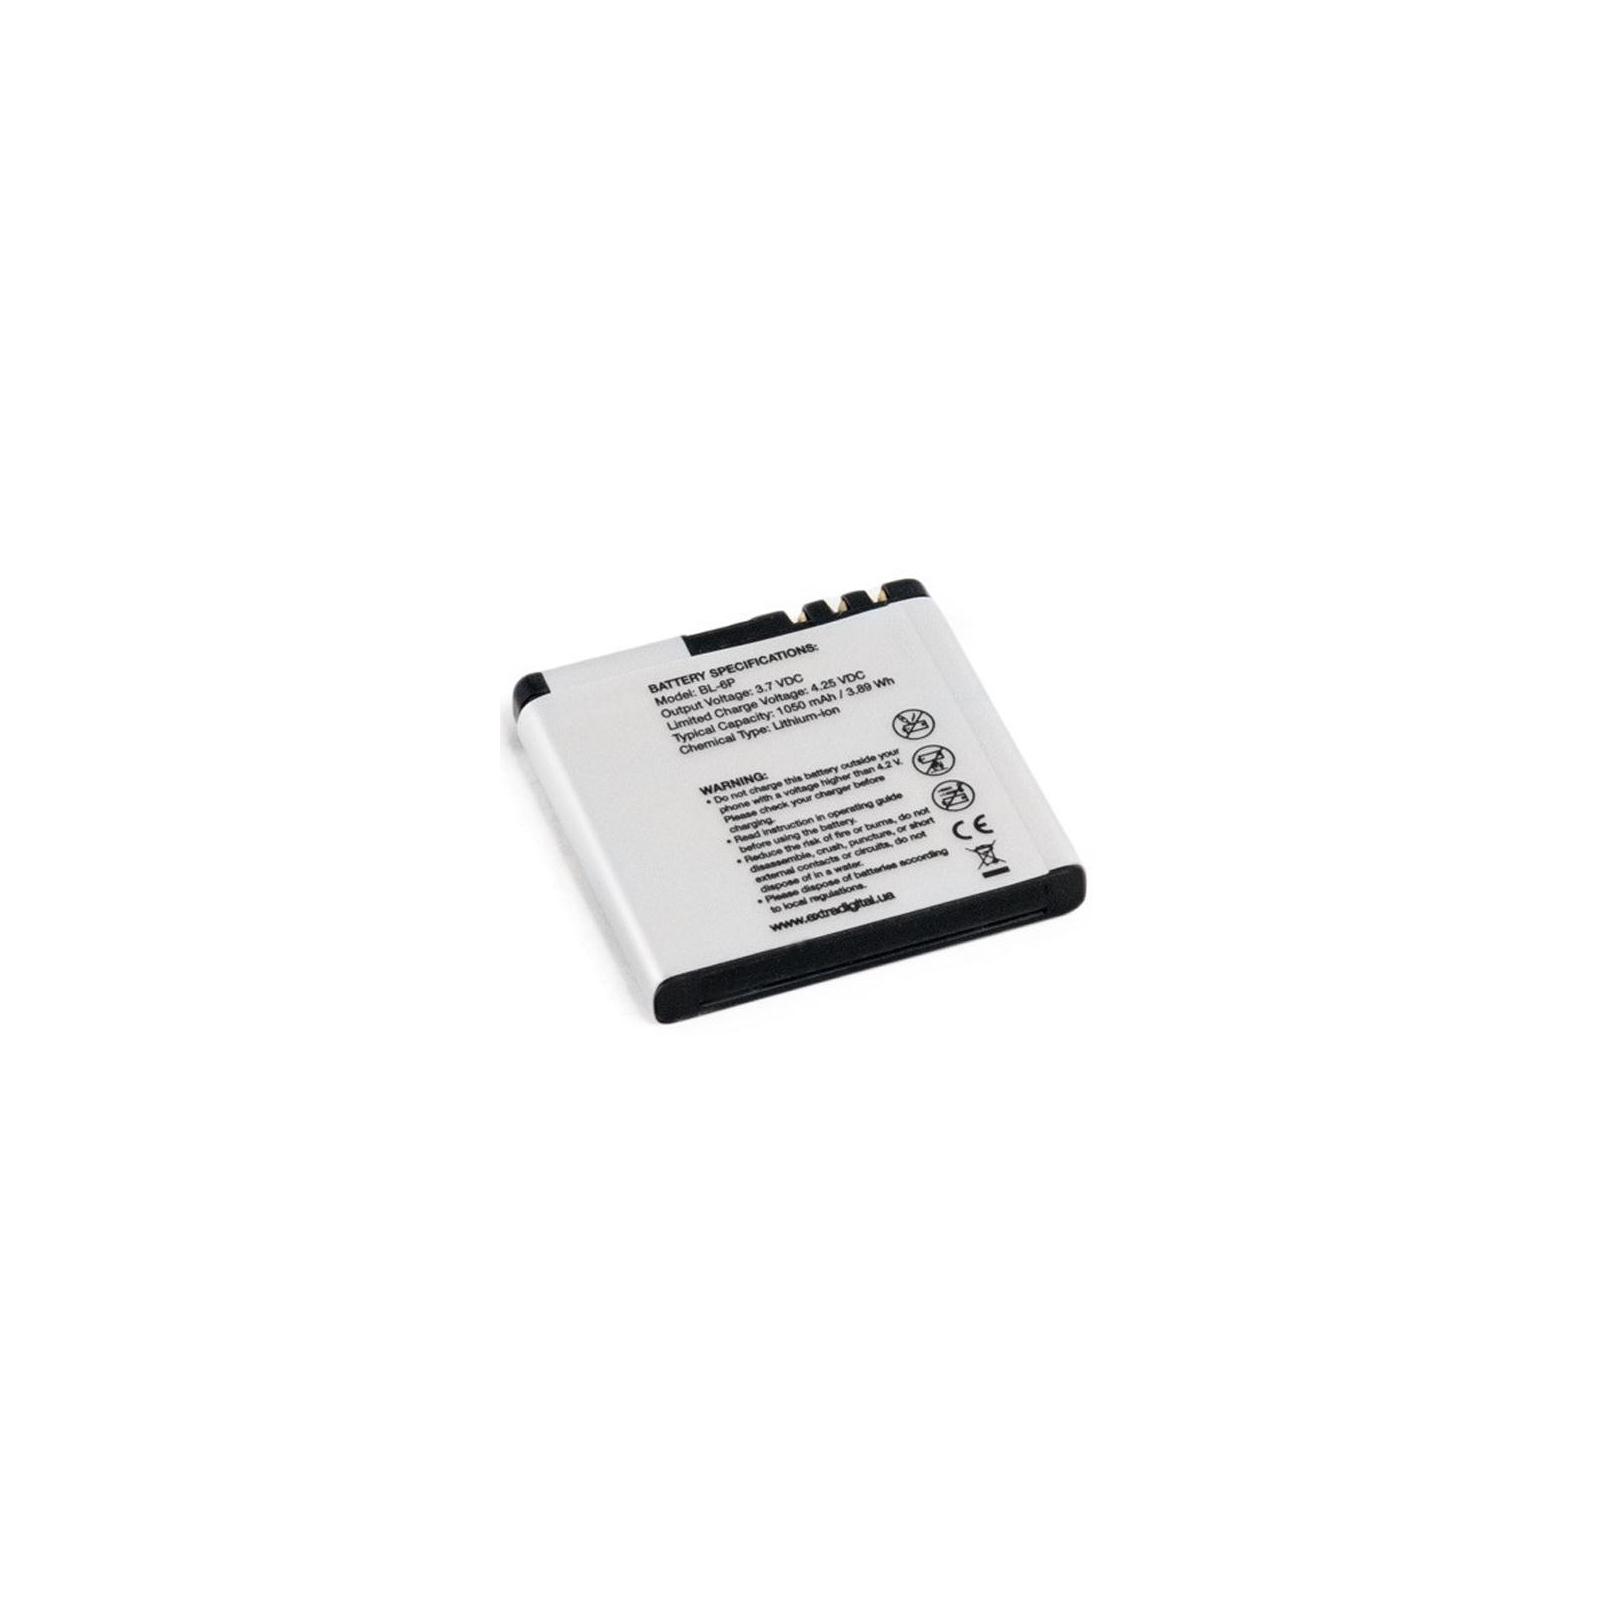 Аккумуляторная батарея EXTRADIGITAL Nokia BL-6P (1050 mAh) (BMN6282) изображение 4